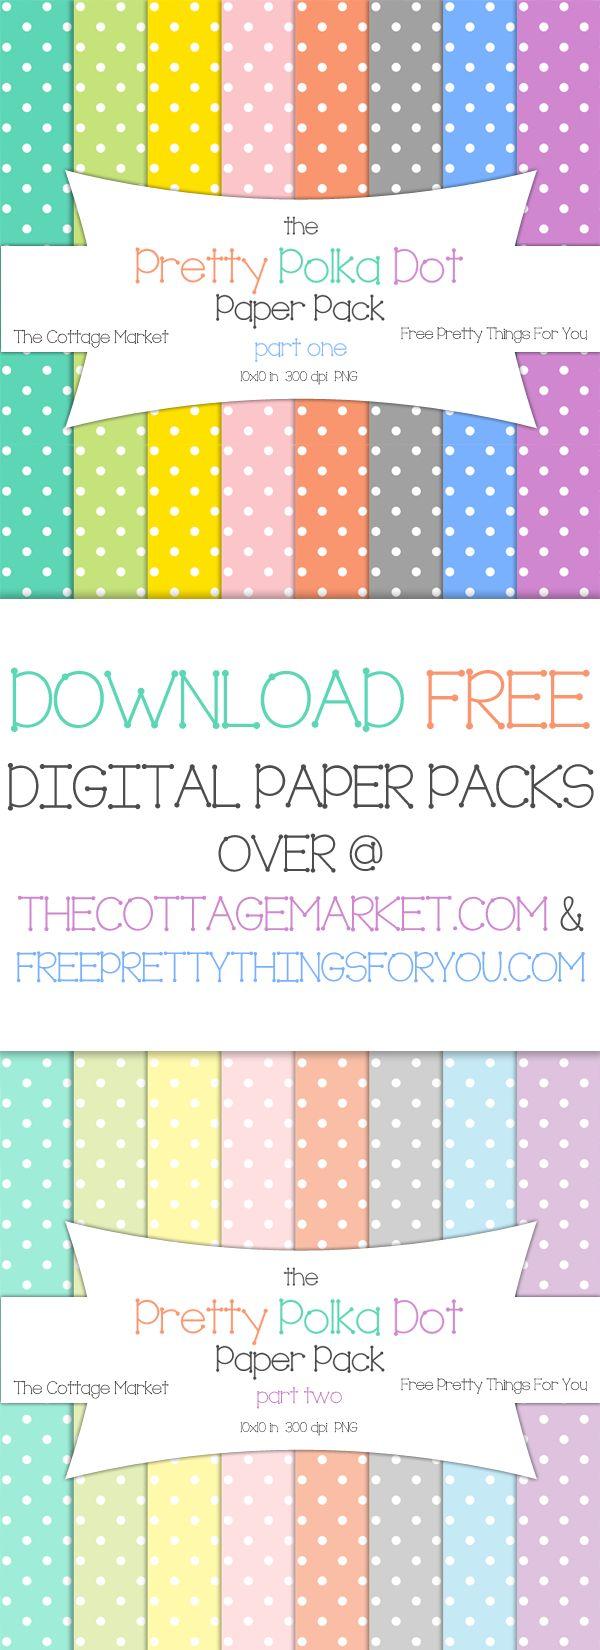 Free Polka Dot Digital Scrapbooking Paper